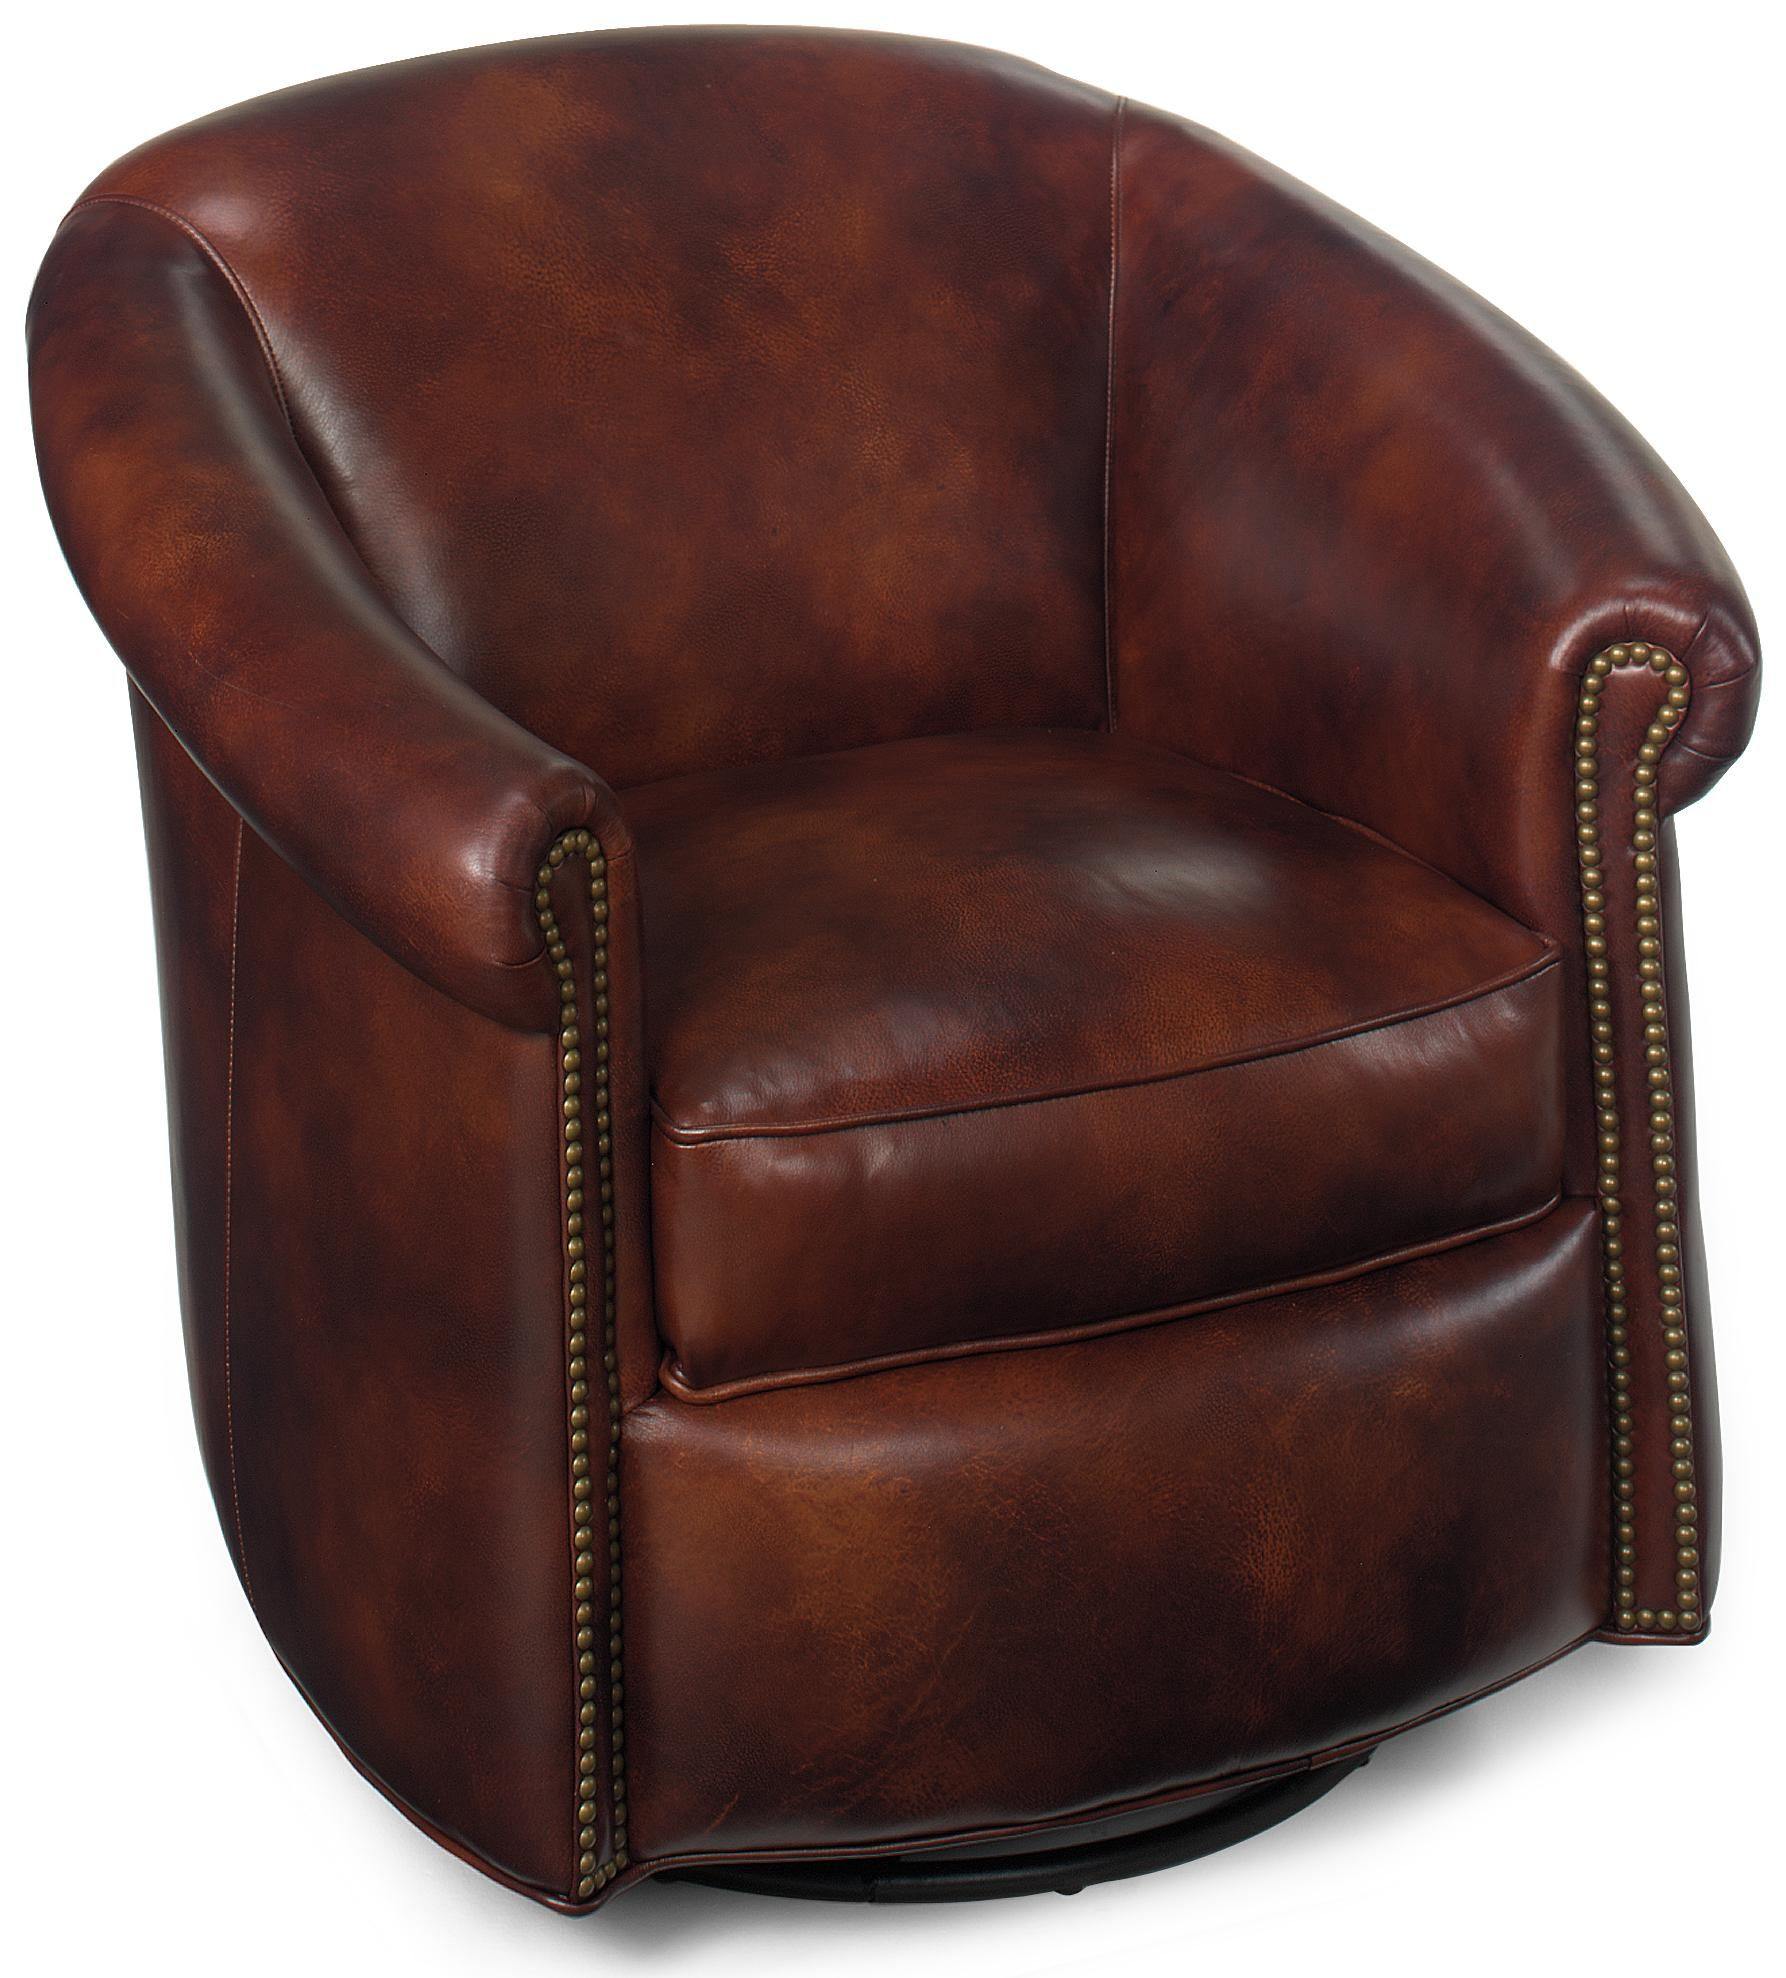 leather swivel barrel chair revolving nagpur tub chairs marietta glider by